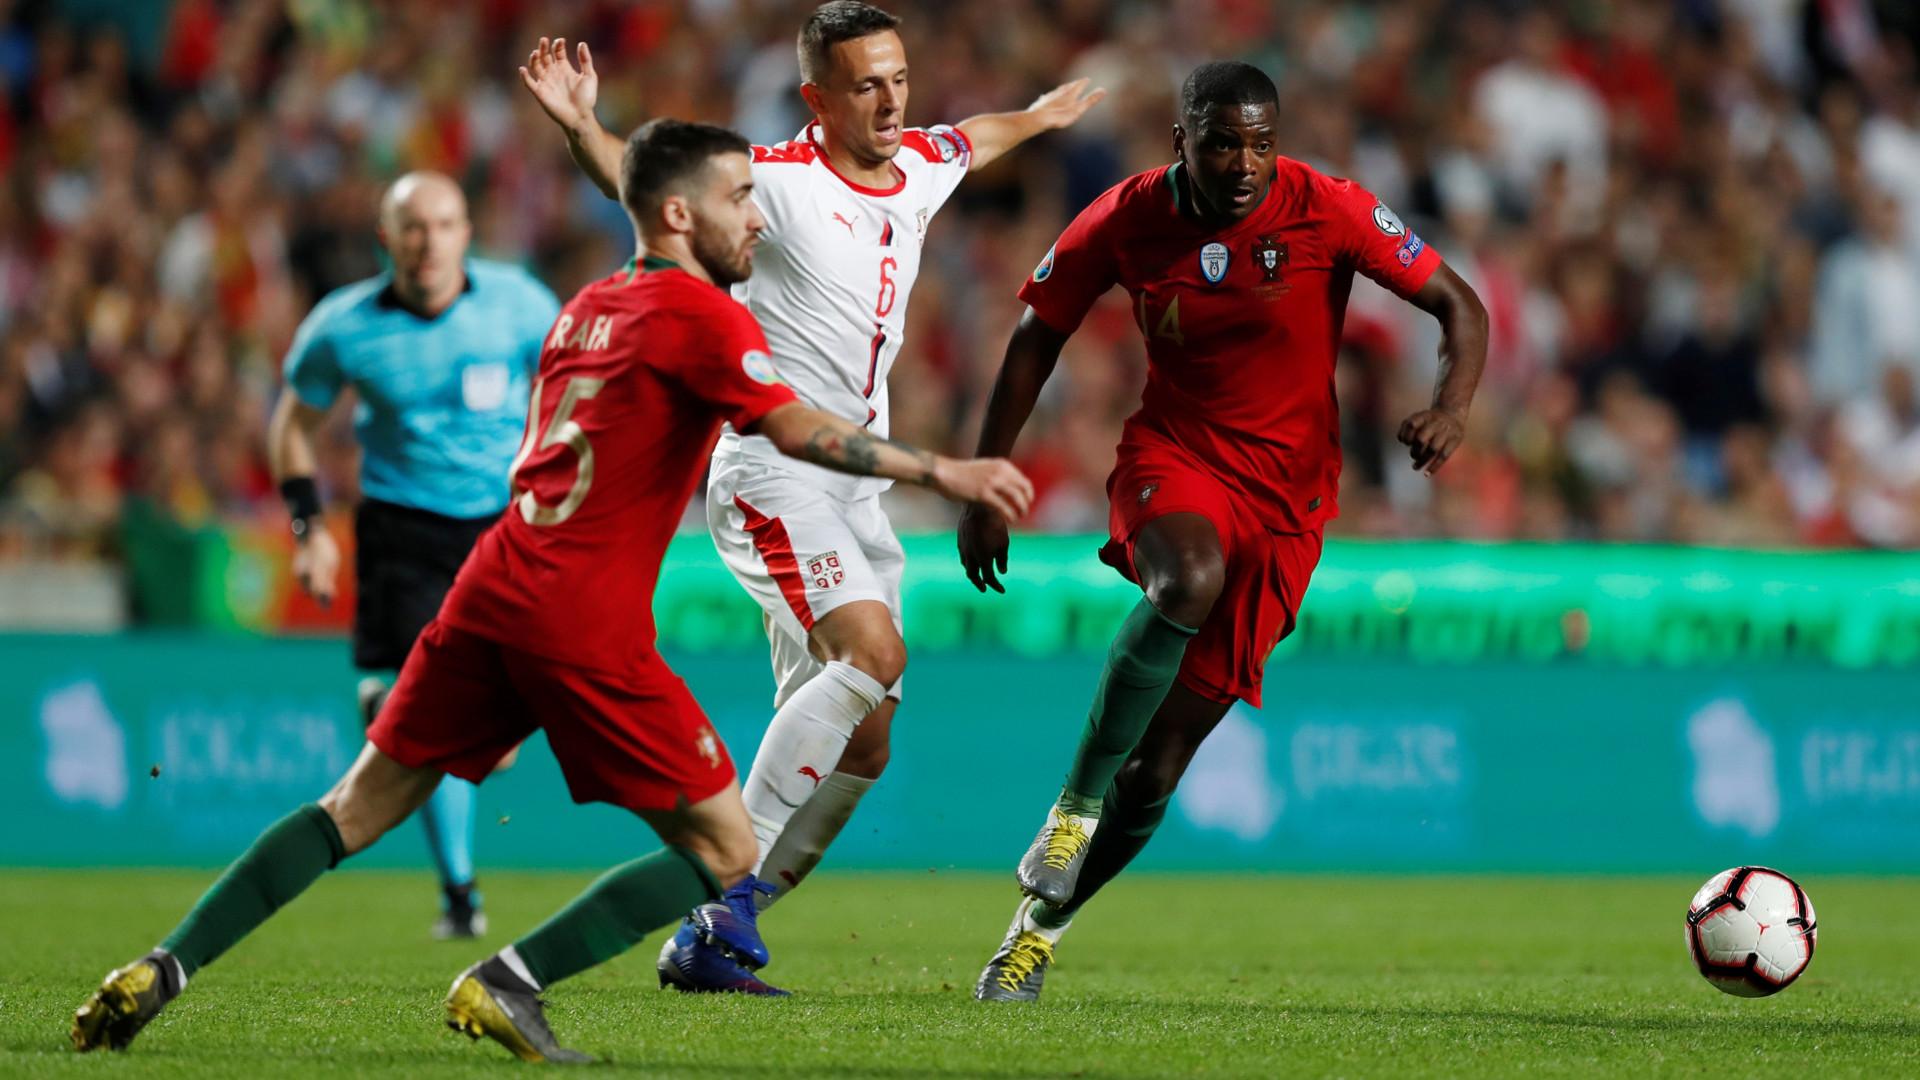 [1-1] Portugal-Sérvia: Já se joga a segunda parte na Luz